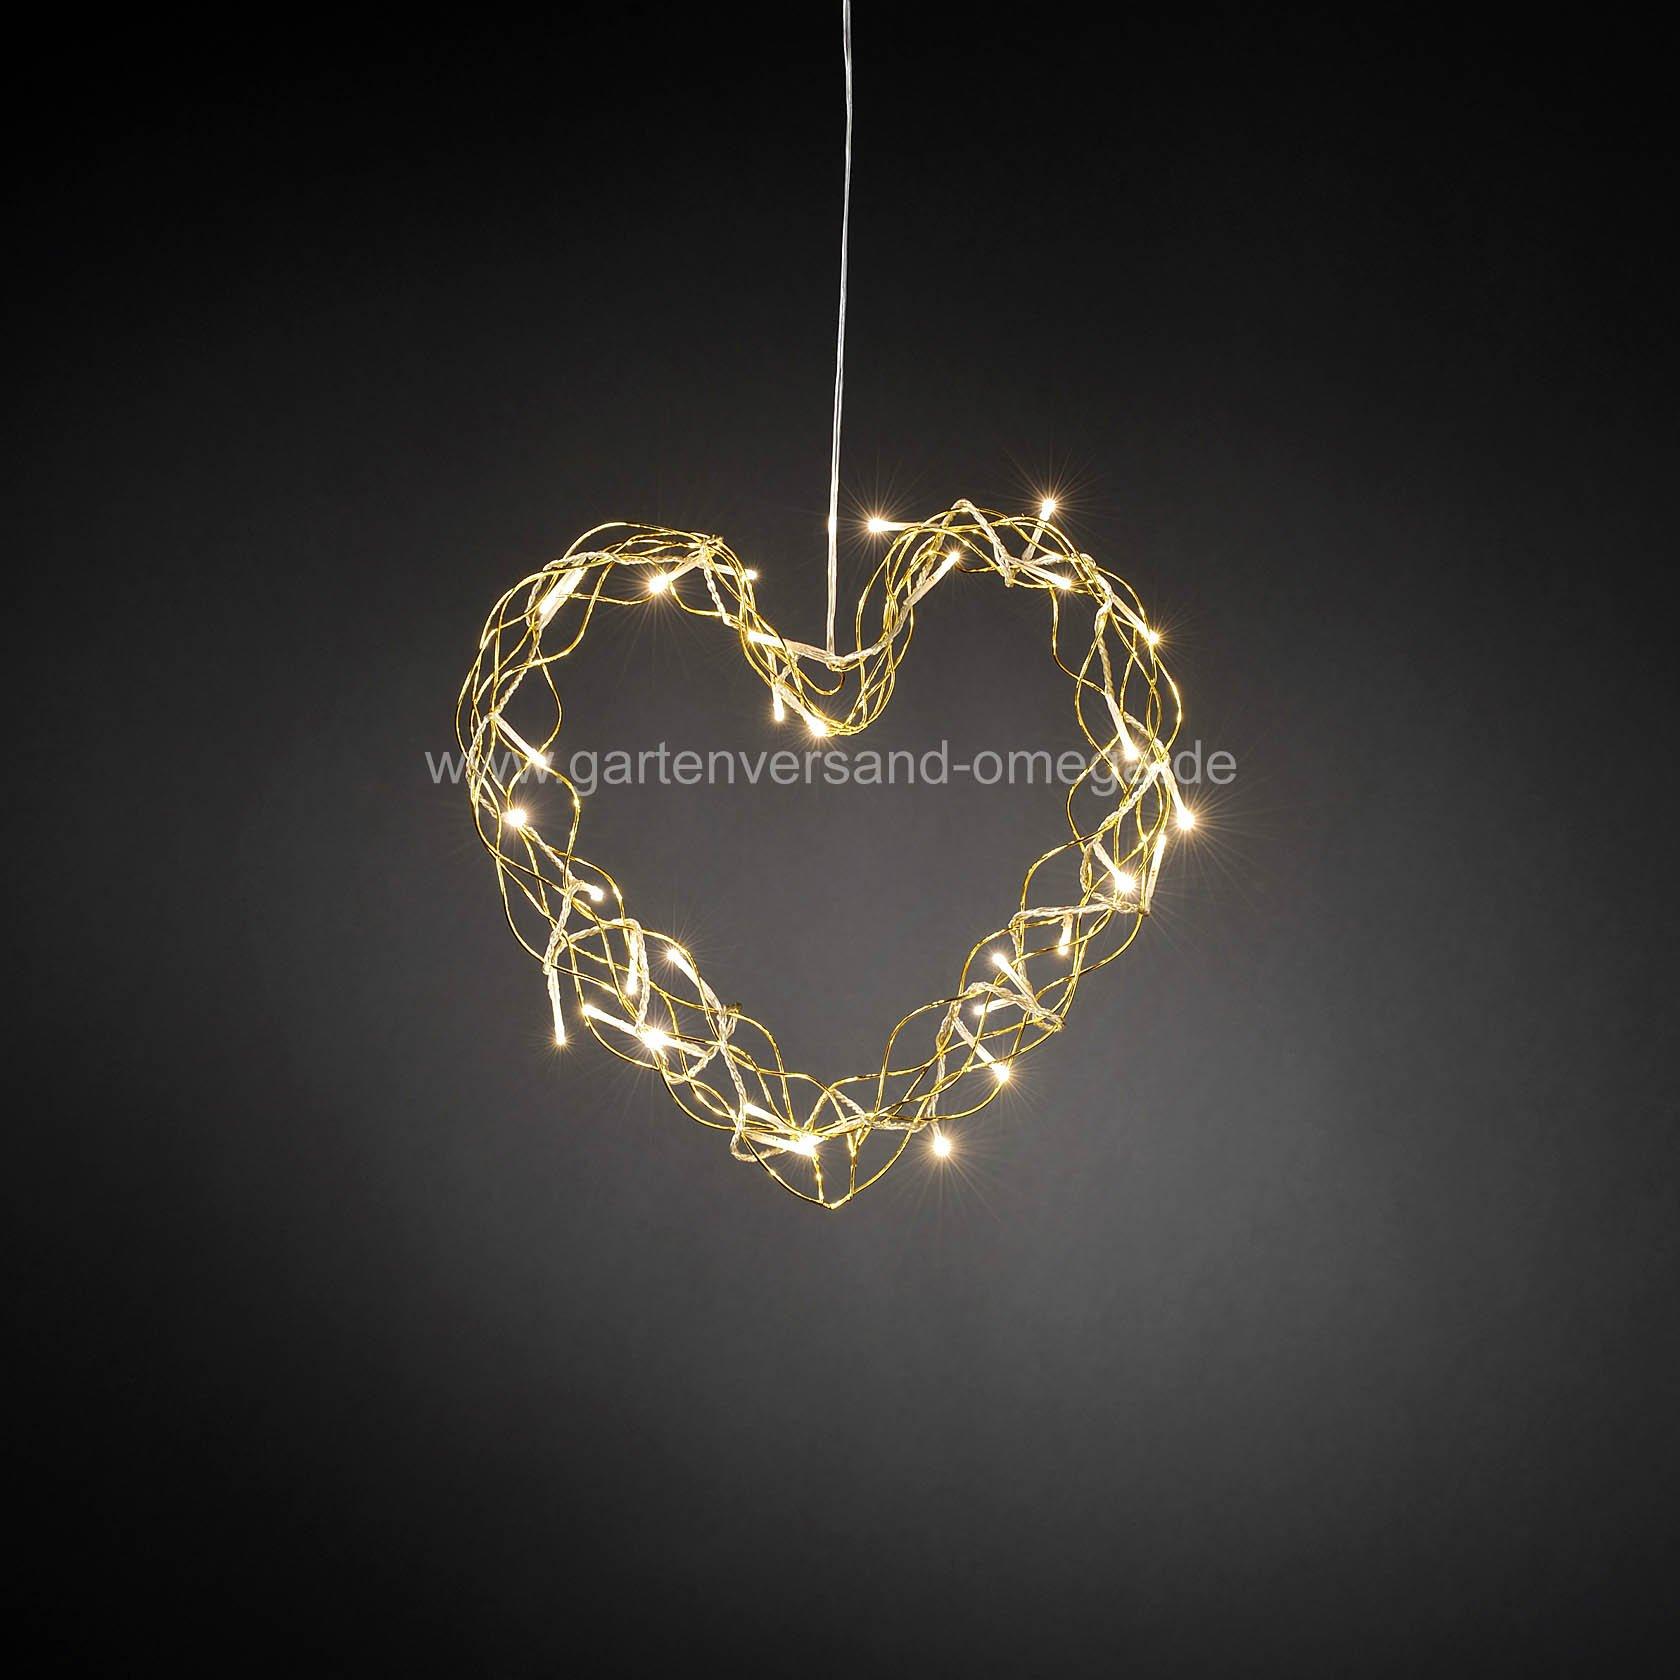 Led metallsilhouette herz gold dekorationsbeleuchtung energiesparende weihnachtsbeleuchtung - Lichterkette am fenster aufhangen ...